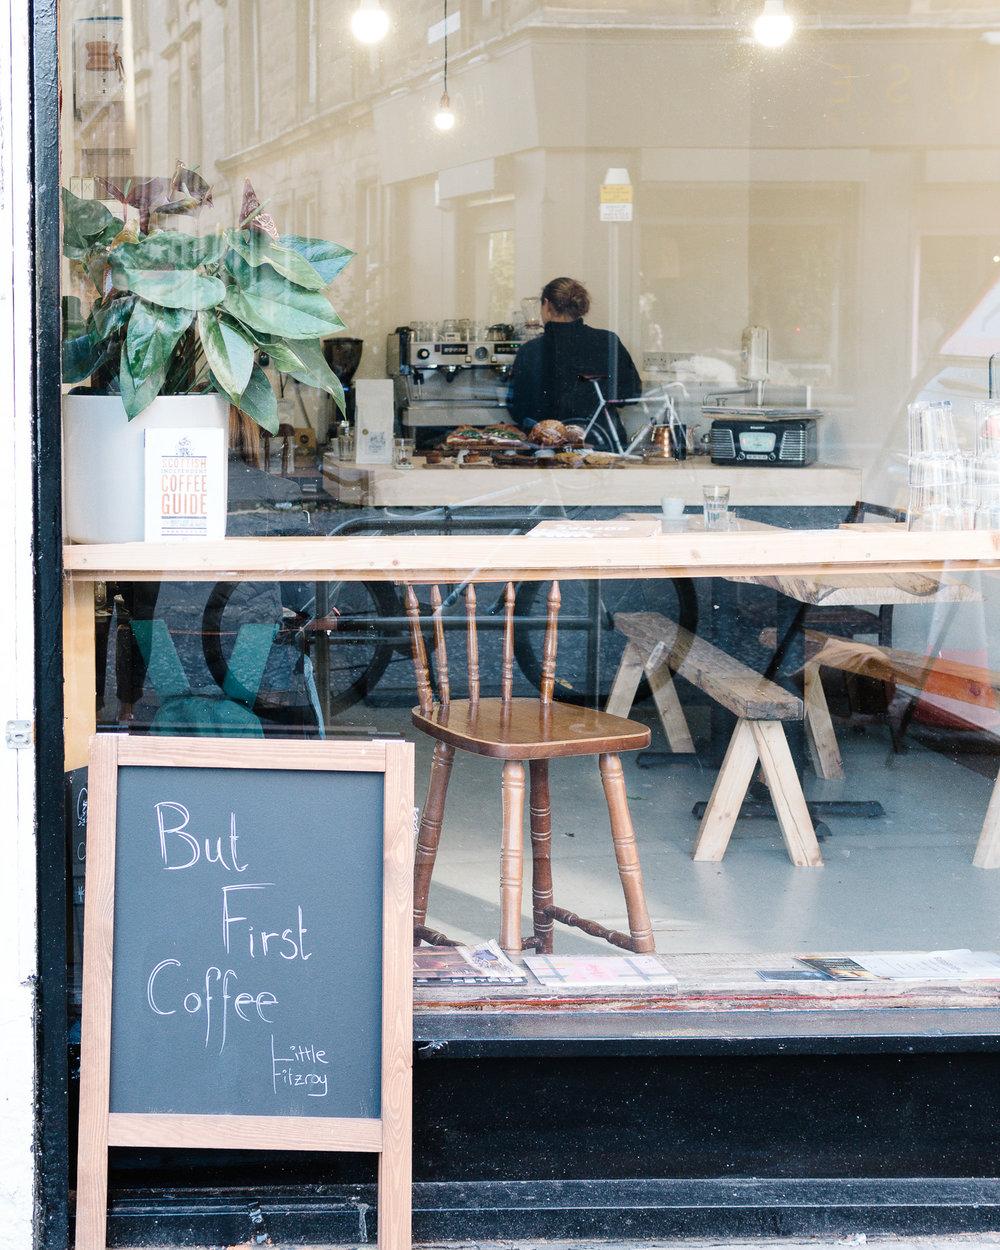 Little Fitzroy coffee shop Edinburgh exterior